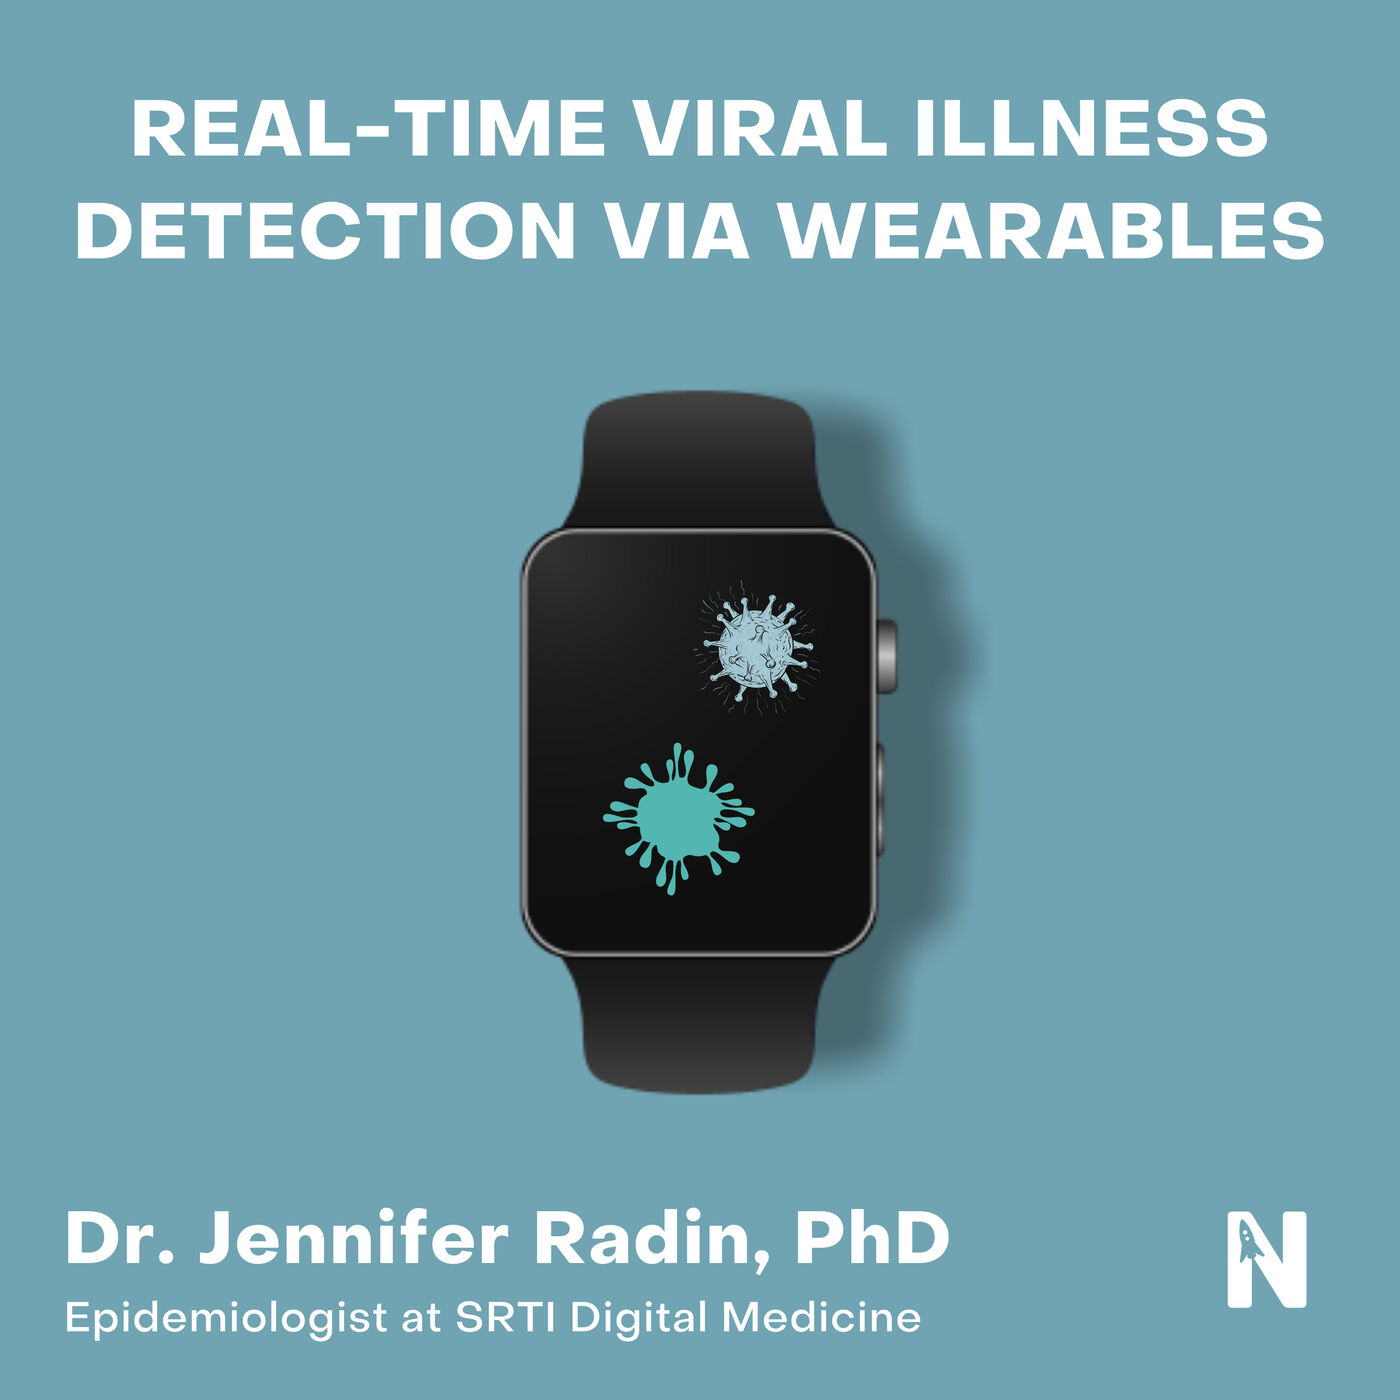 Real-Time Viral Illness Detection Via Wearables   Jennifer Radin